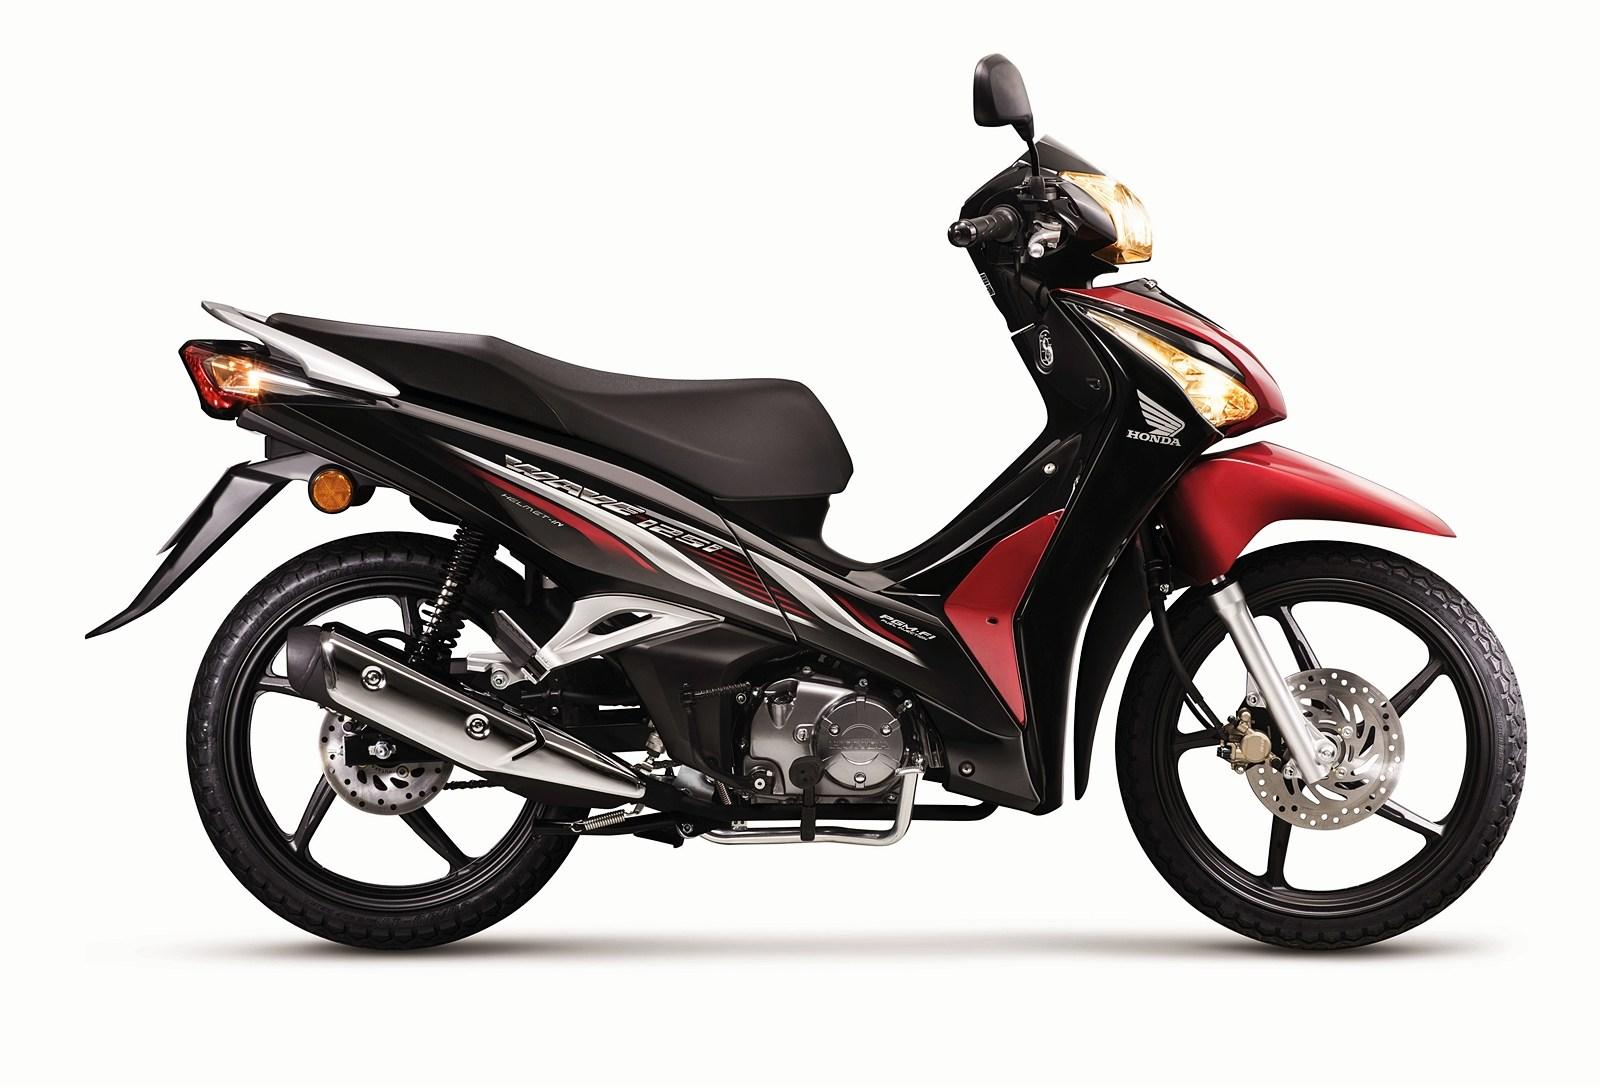 Honda thailand introduces all new wave 125i